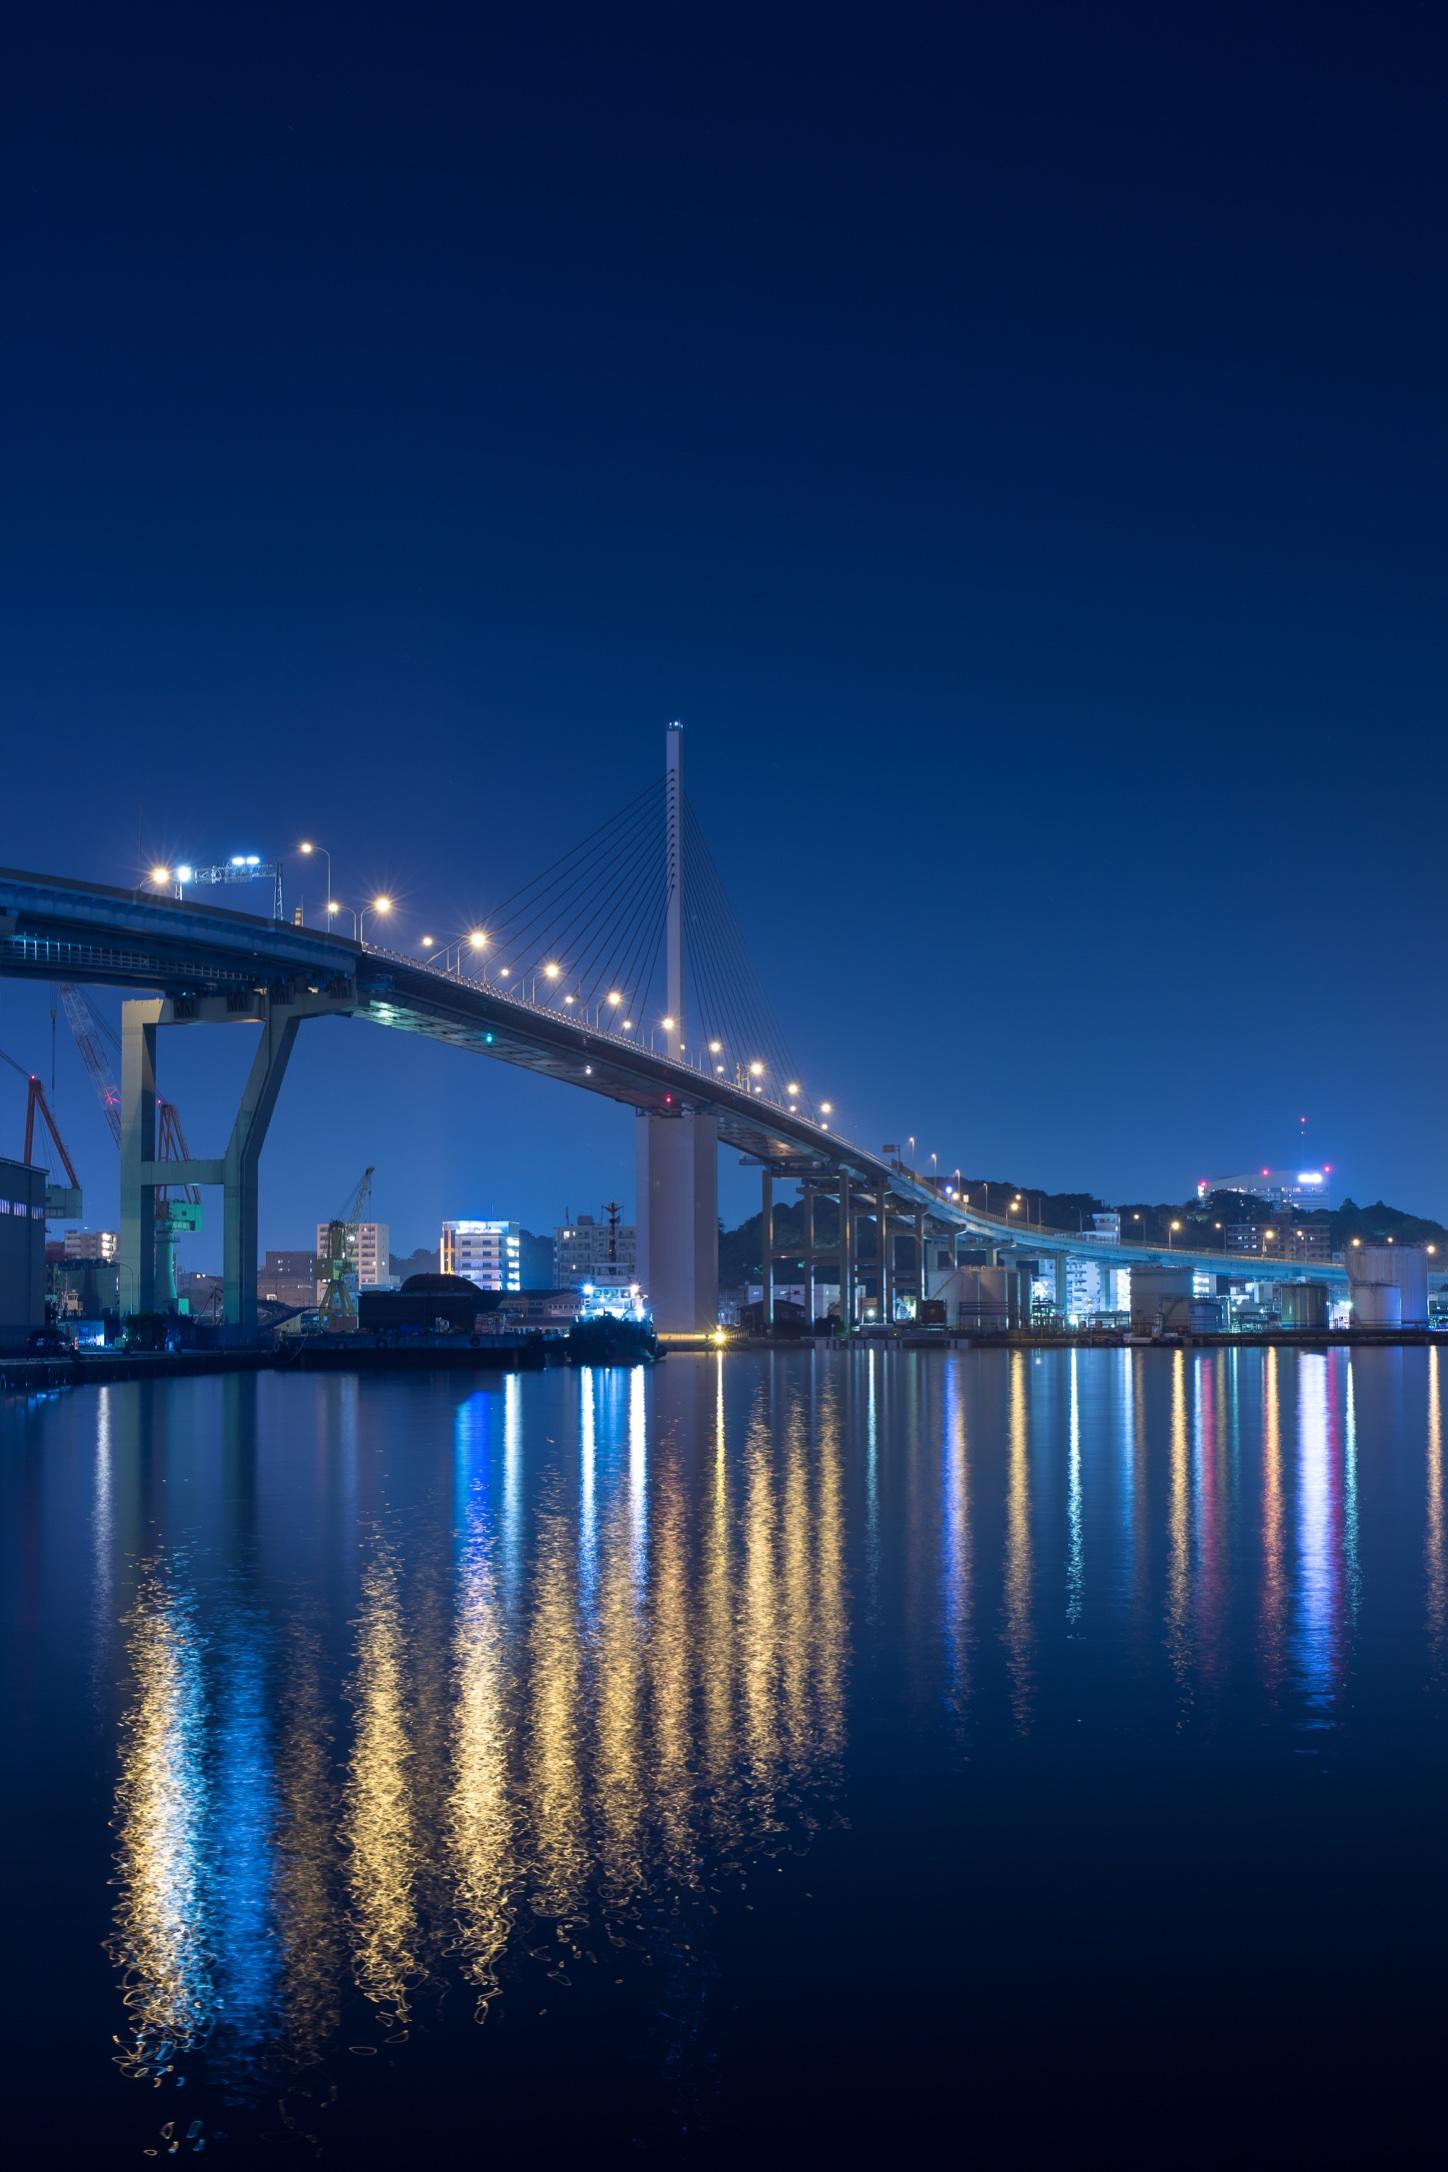 荒津大橋の画像